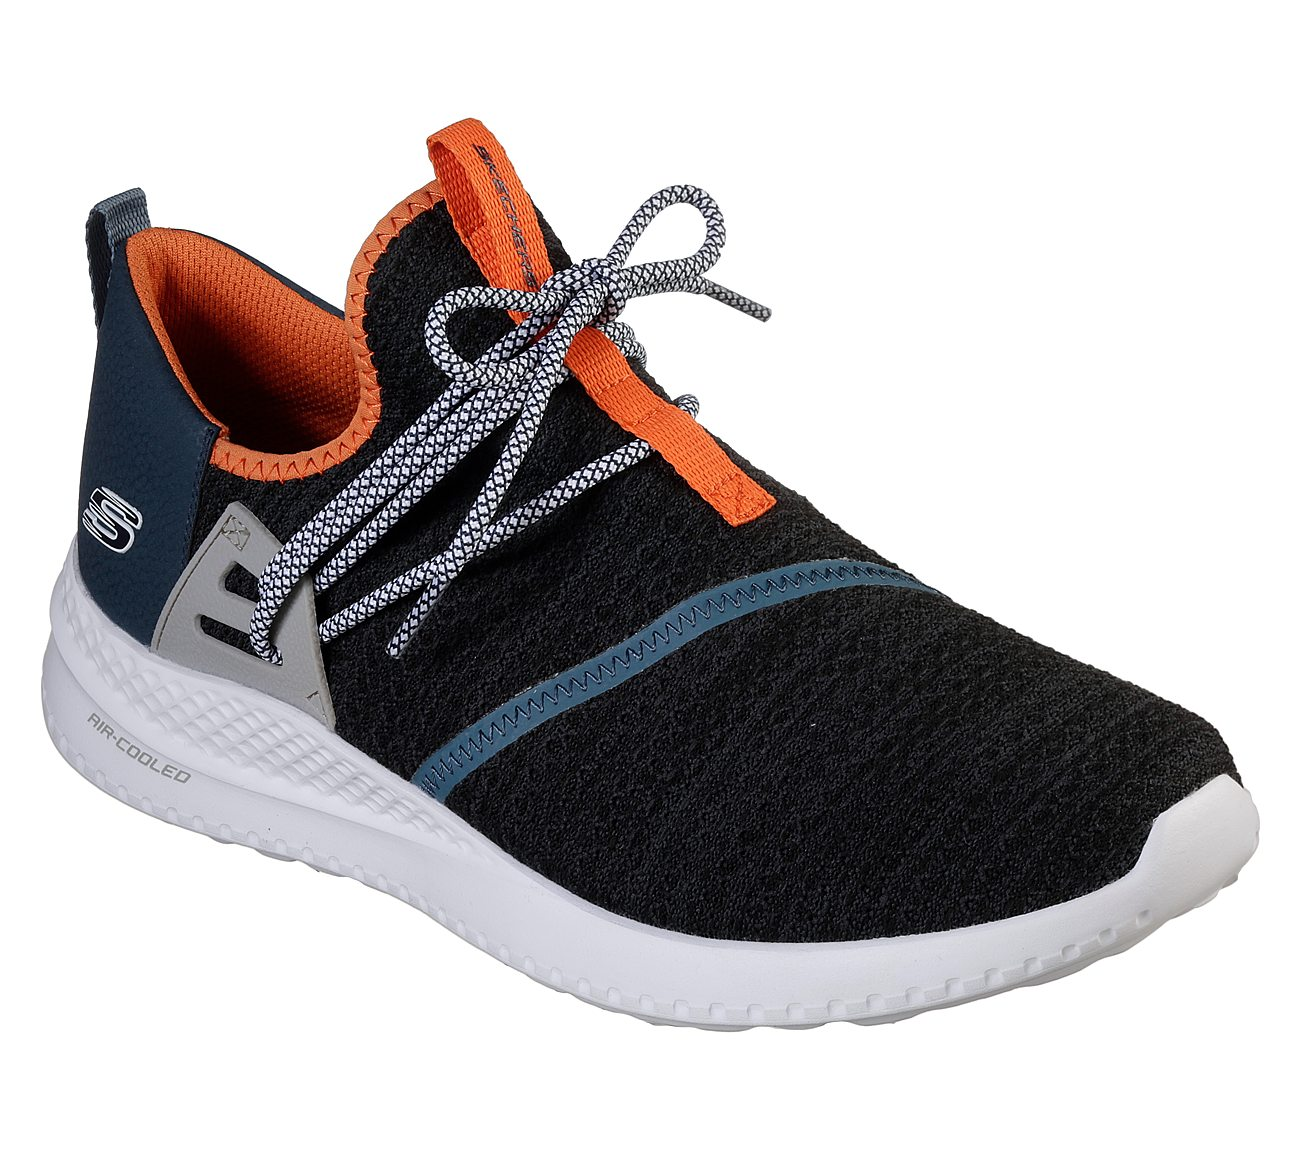 skechers orange shoes